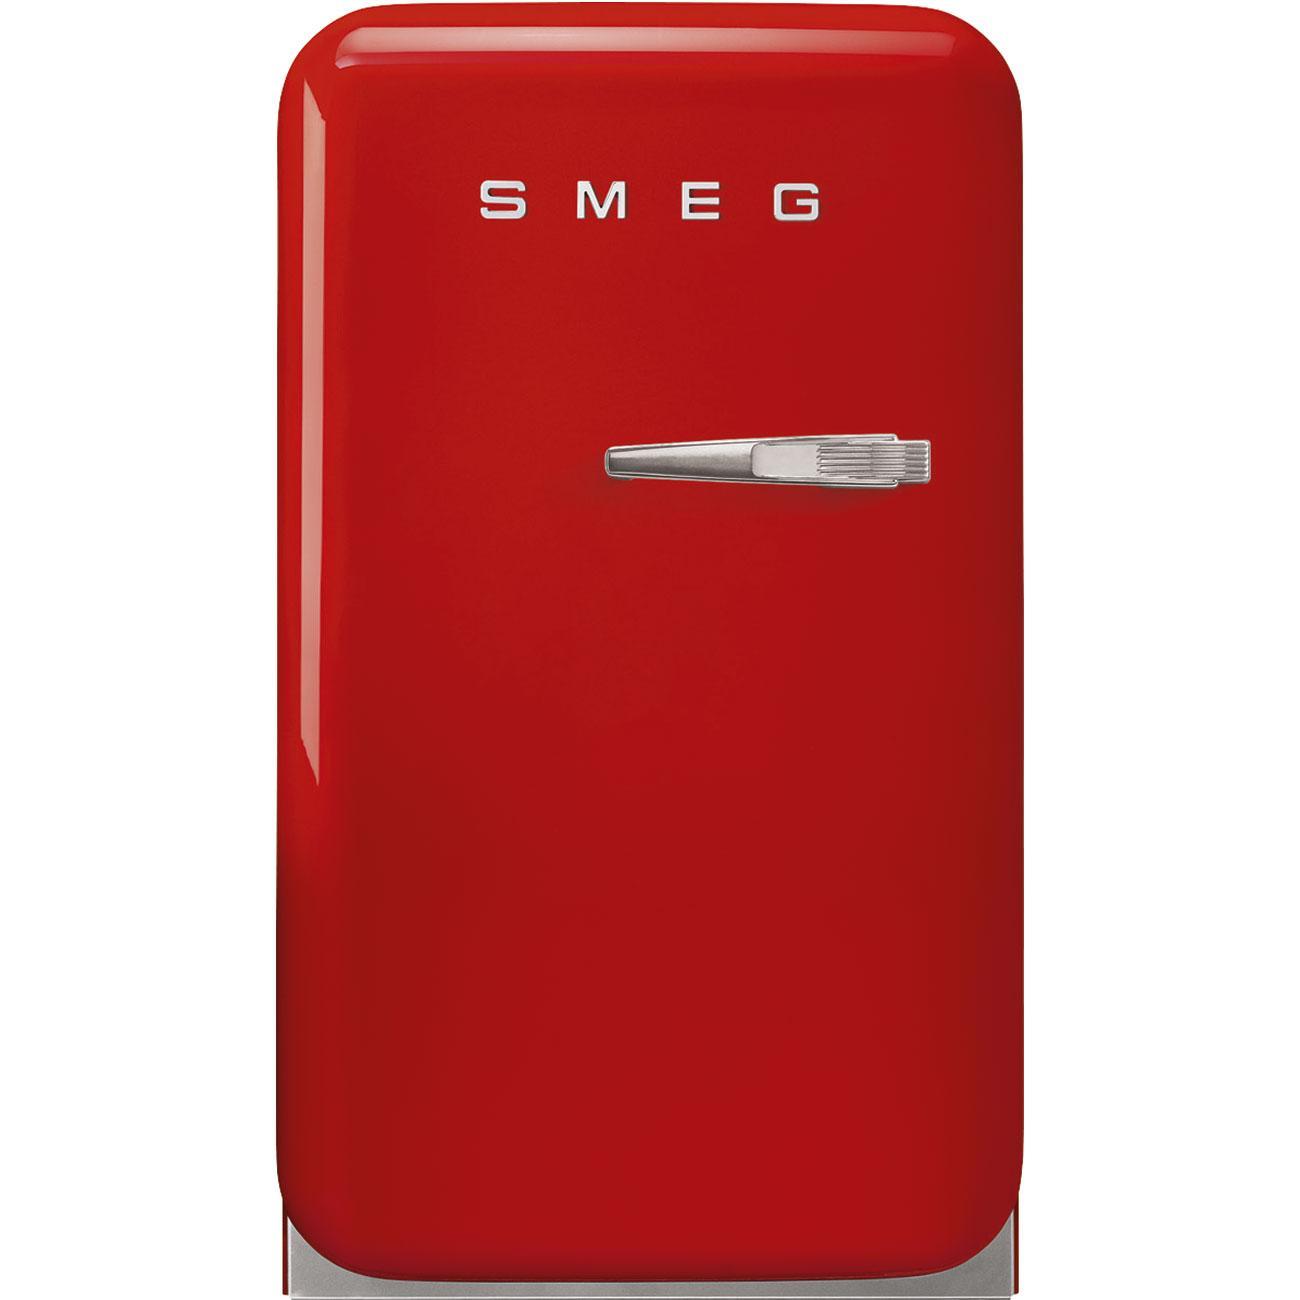 SmegRetro-Style Mini Refrigerator, Left-Hand Hinge, Red